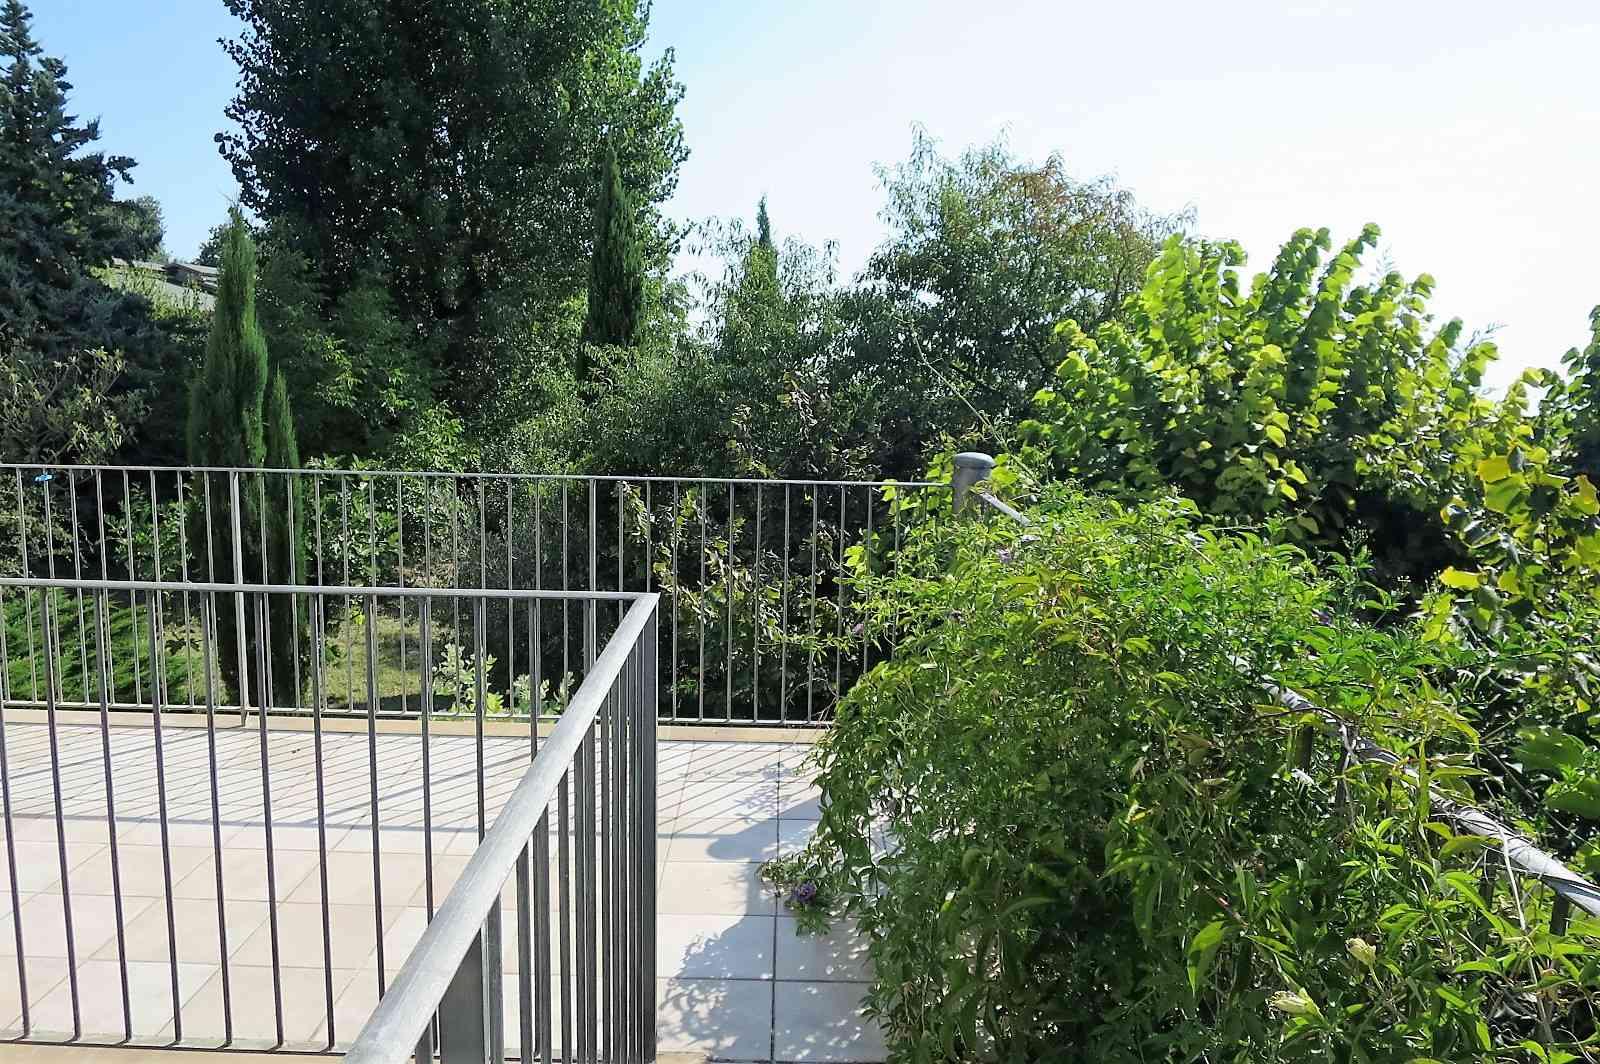 Villa Villa in vendita Atri (TE), Villa Paola - Atri - EUR 473.281 200